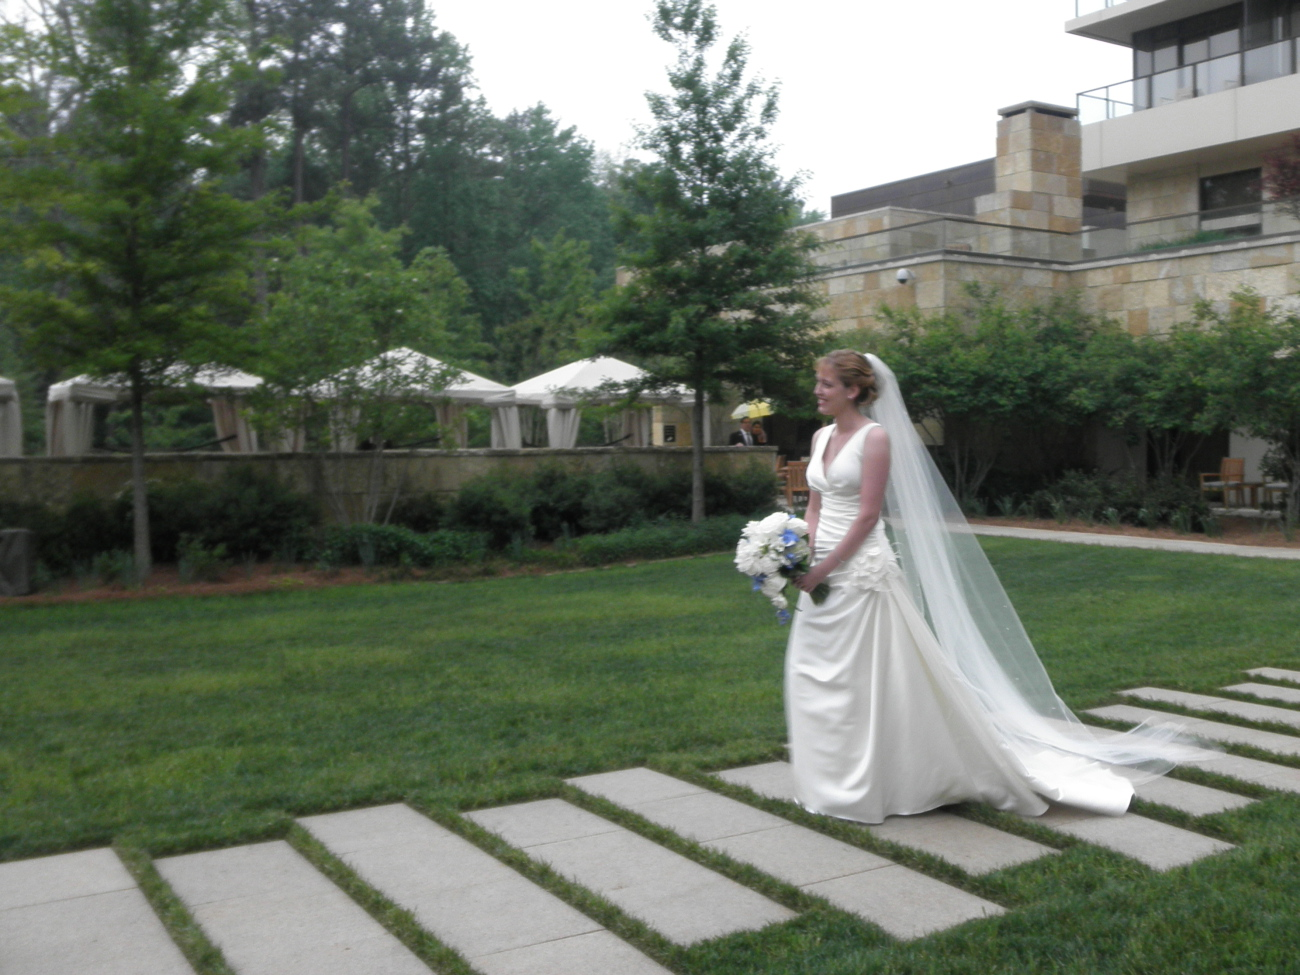 Raleigh Wedding Blog: Ten Tips For Walking Down The Aisle